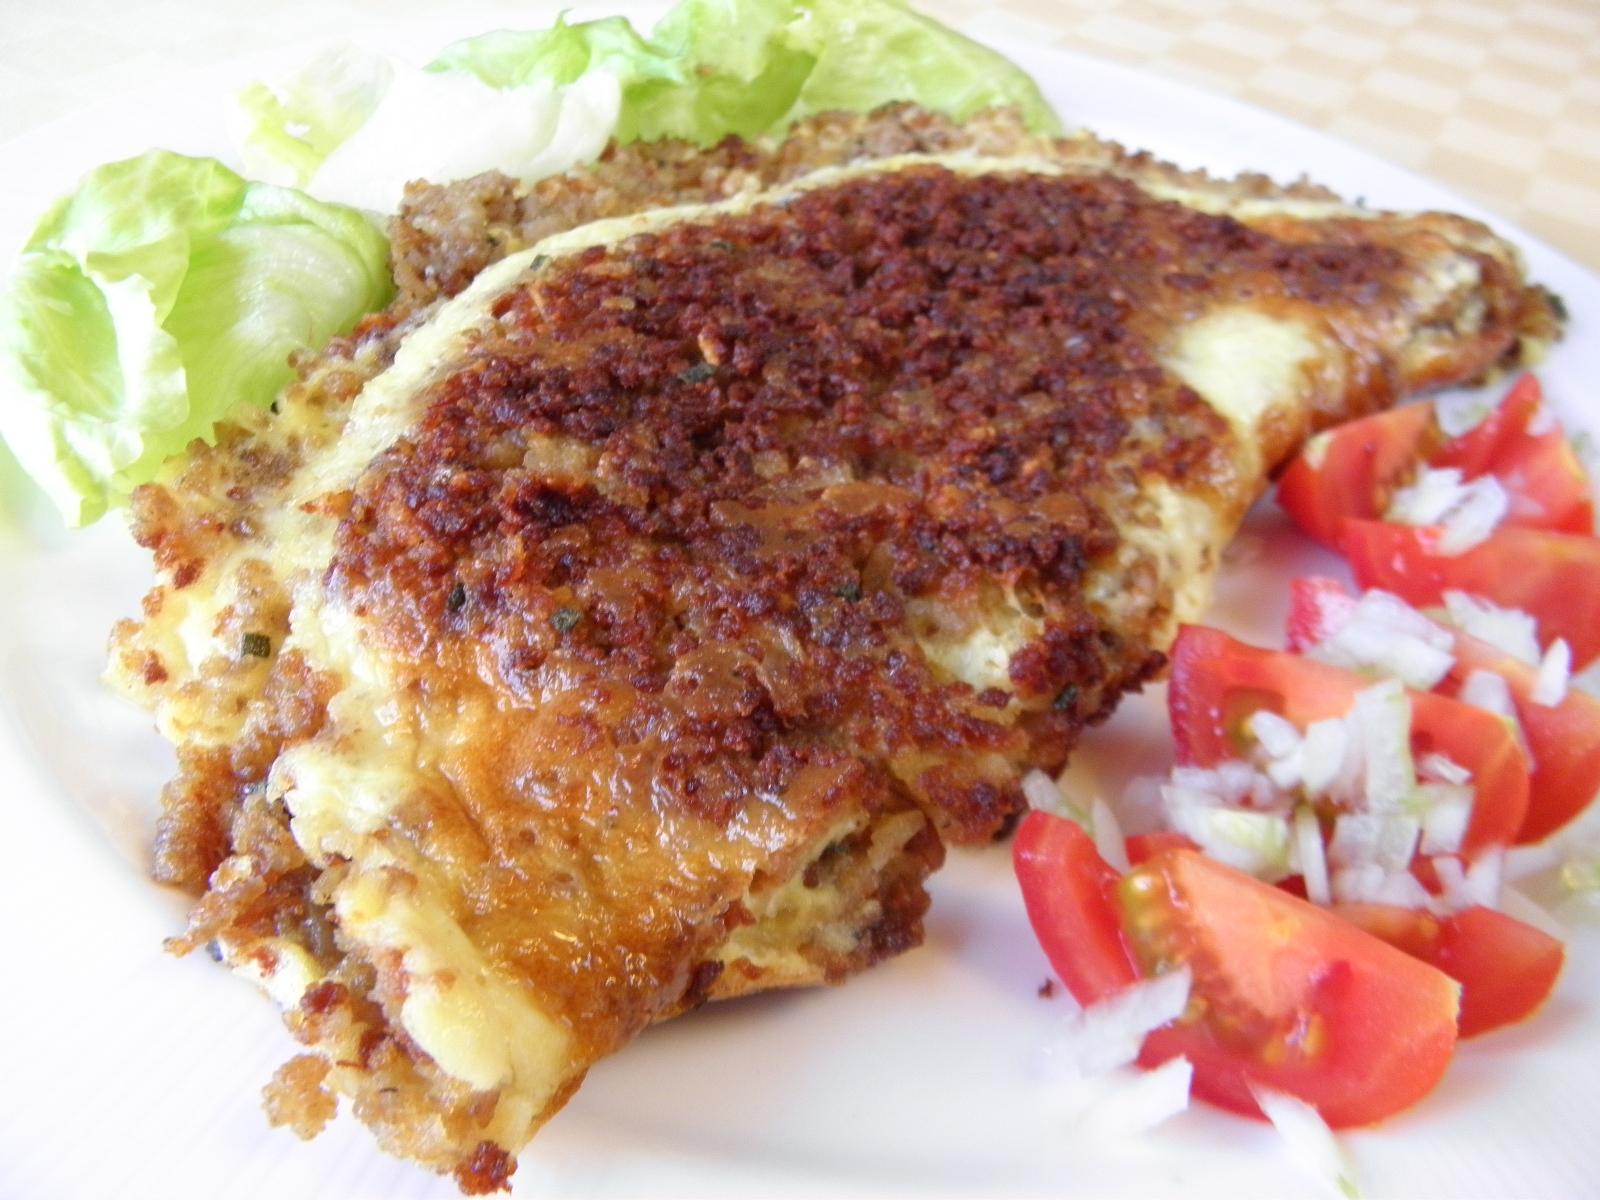 Fotografie receptu: Masová omeleta se sýrem